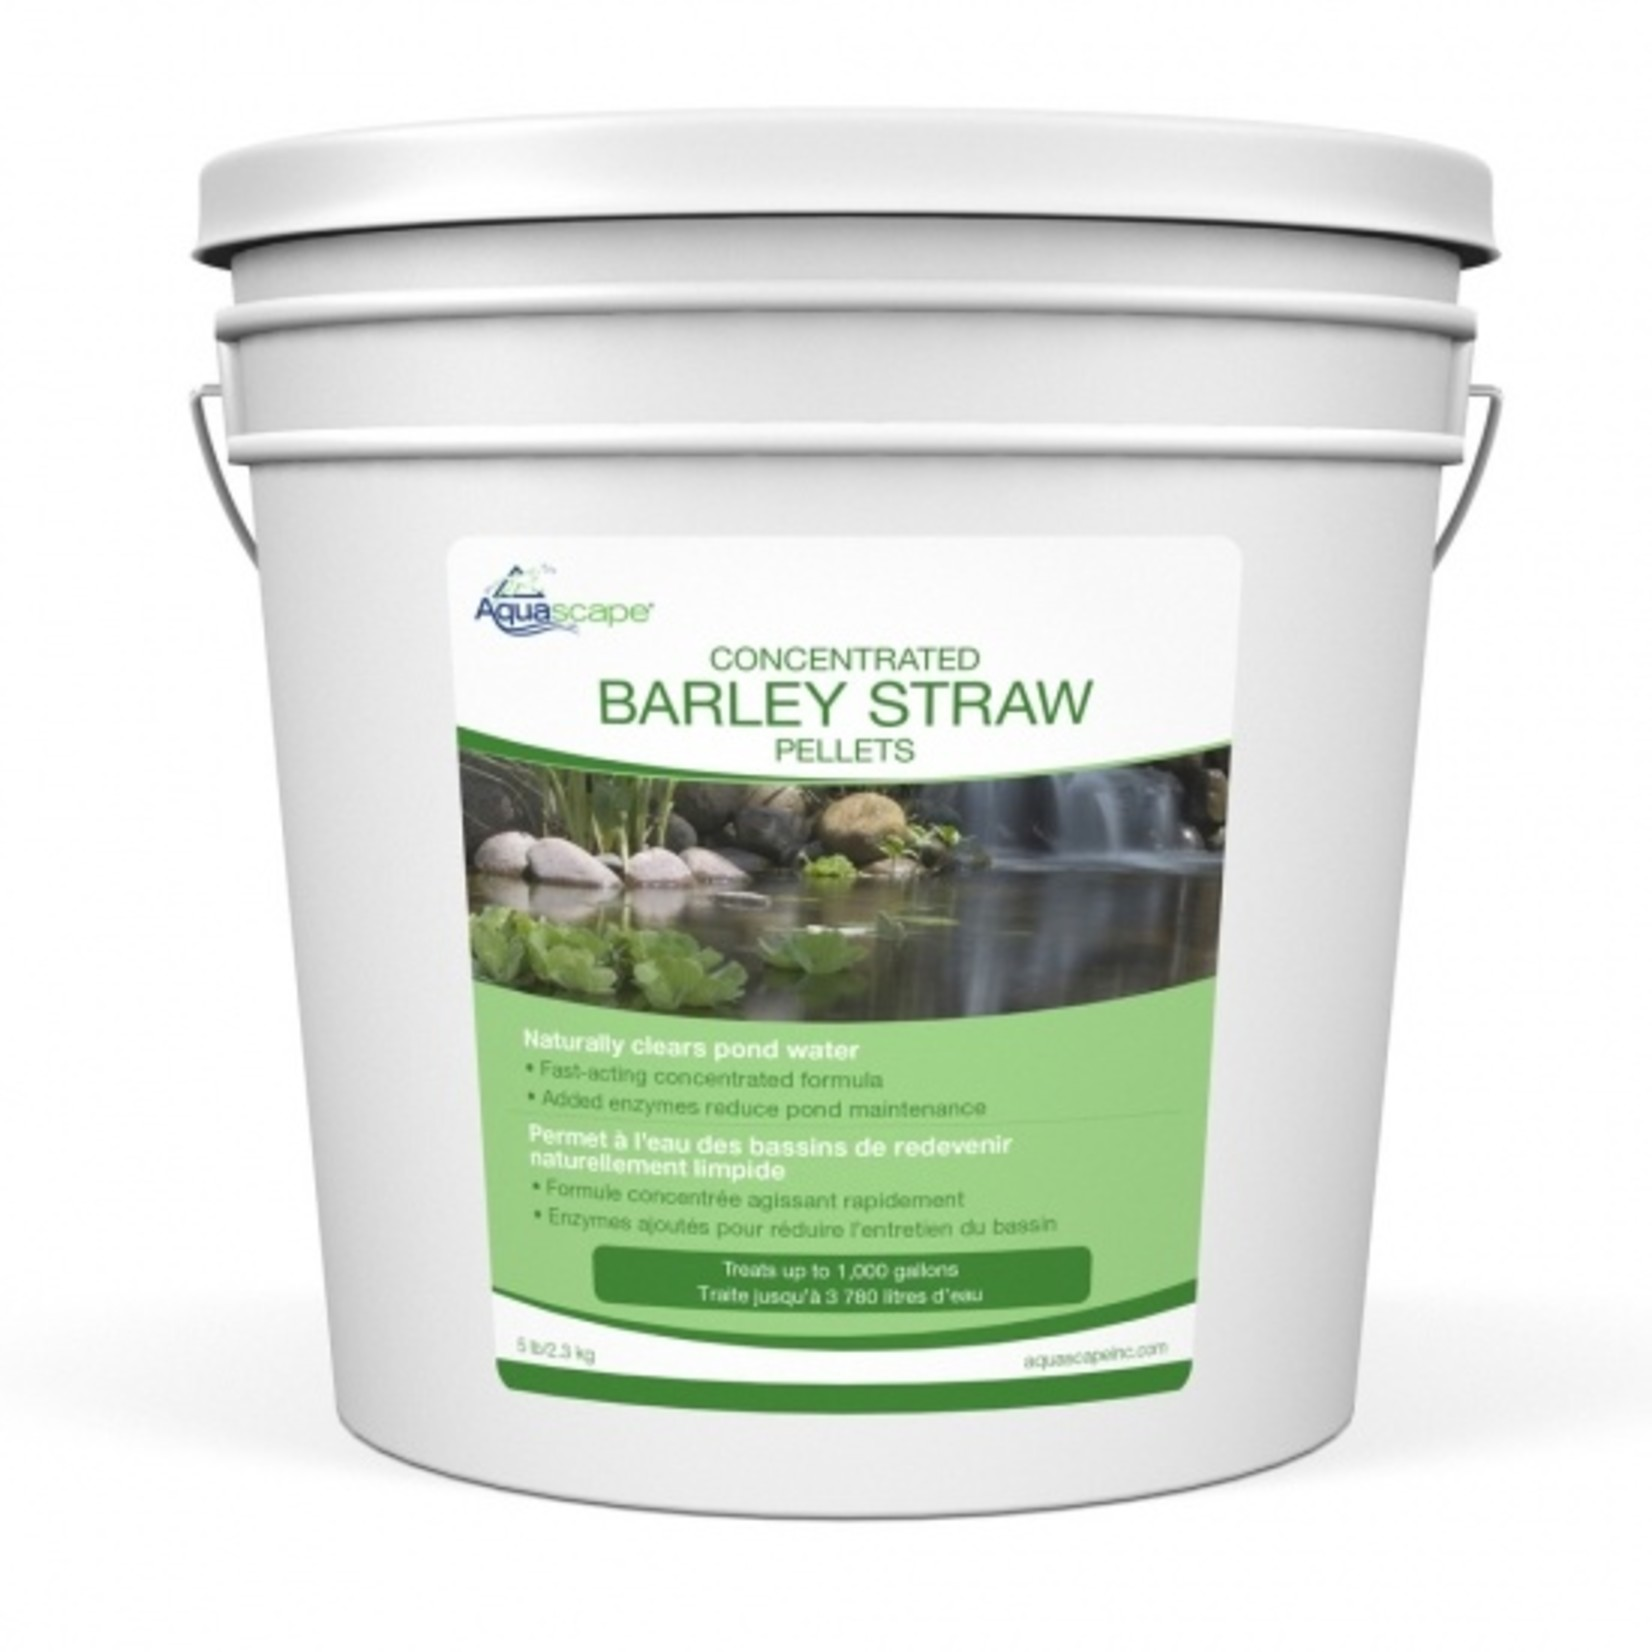 Aquascape Barley Straw Pellets